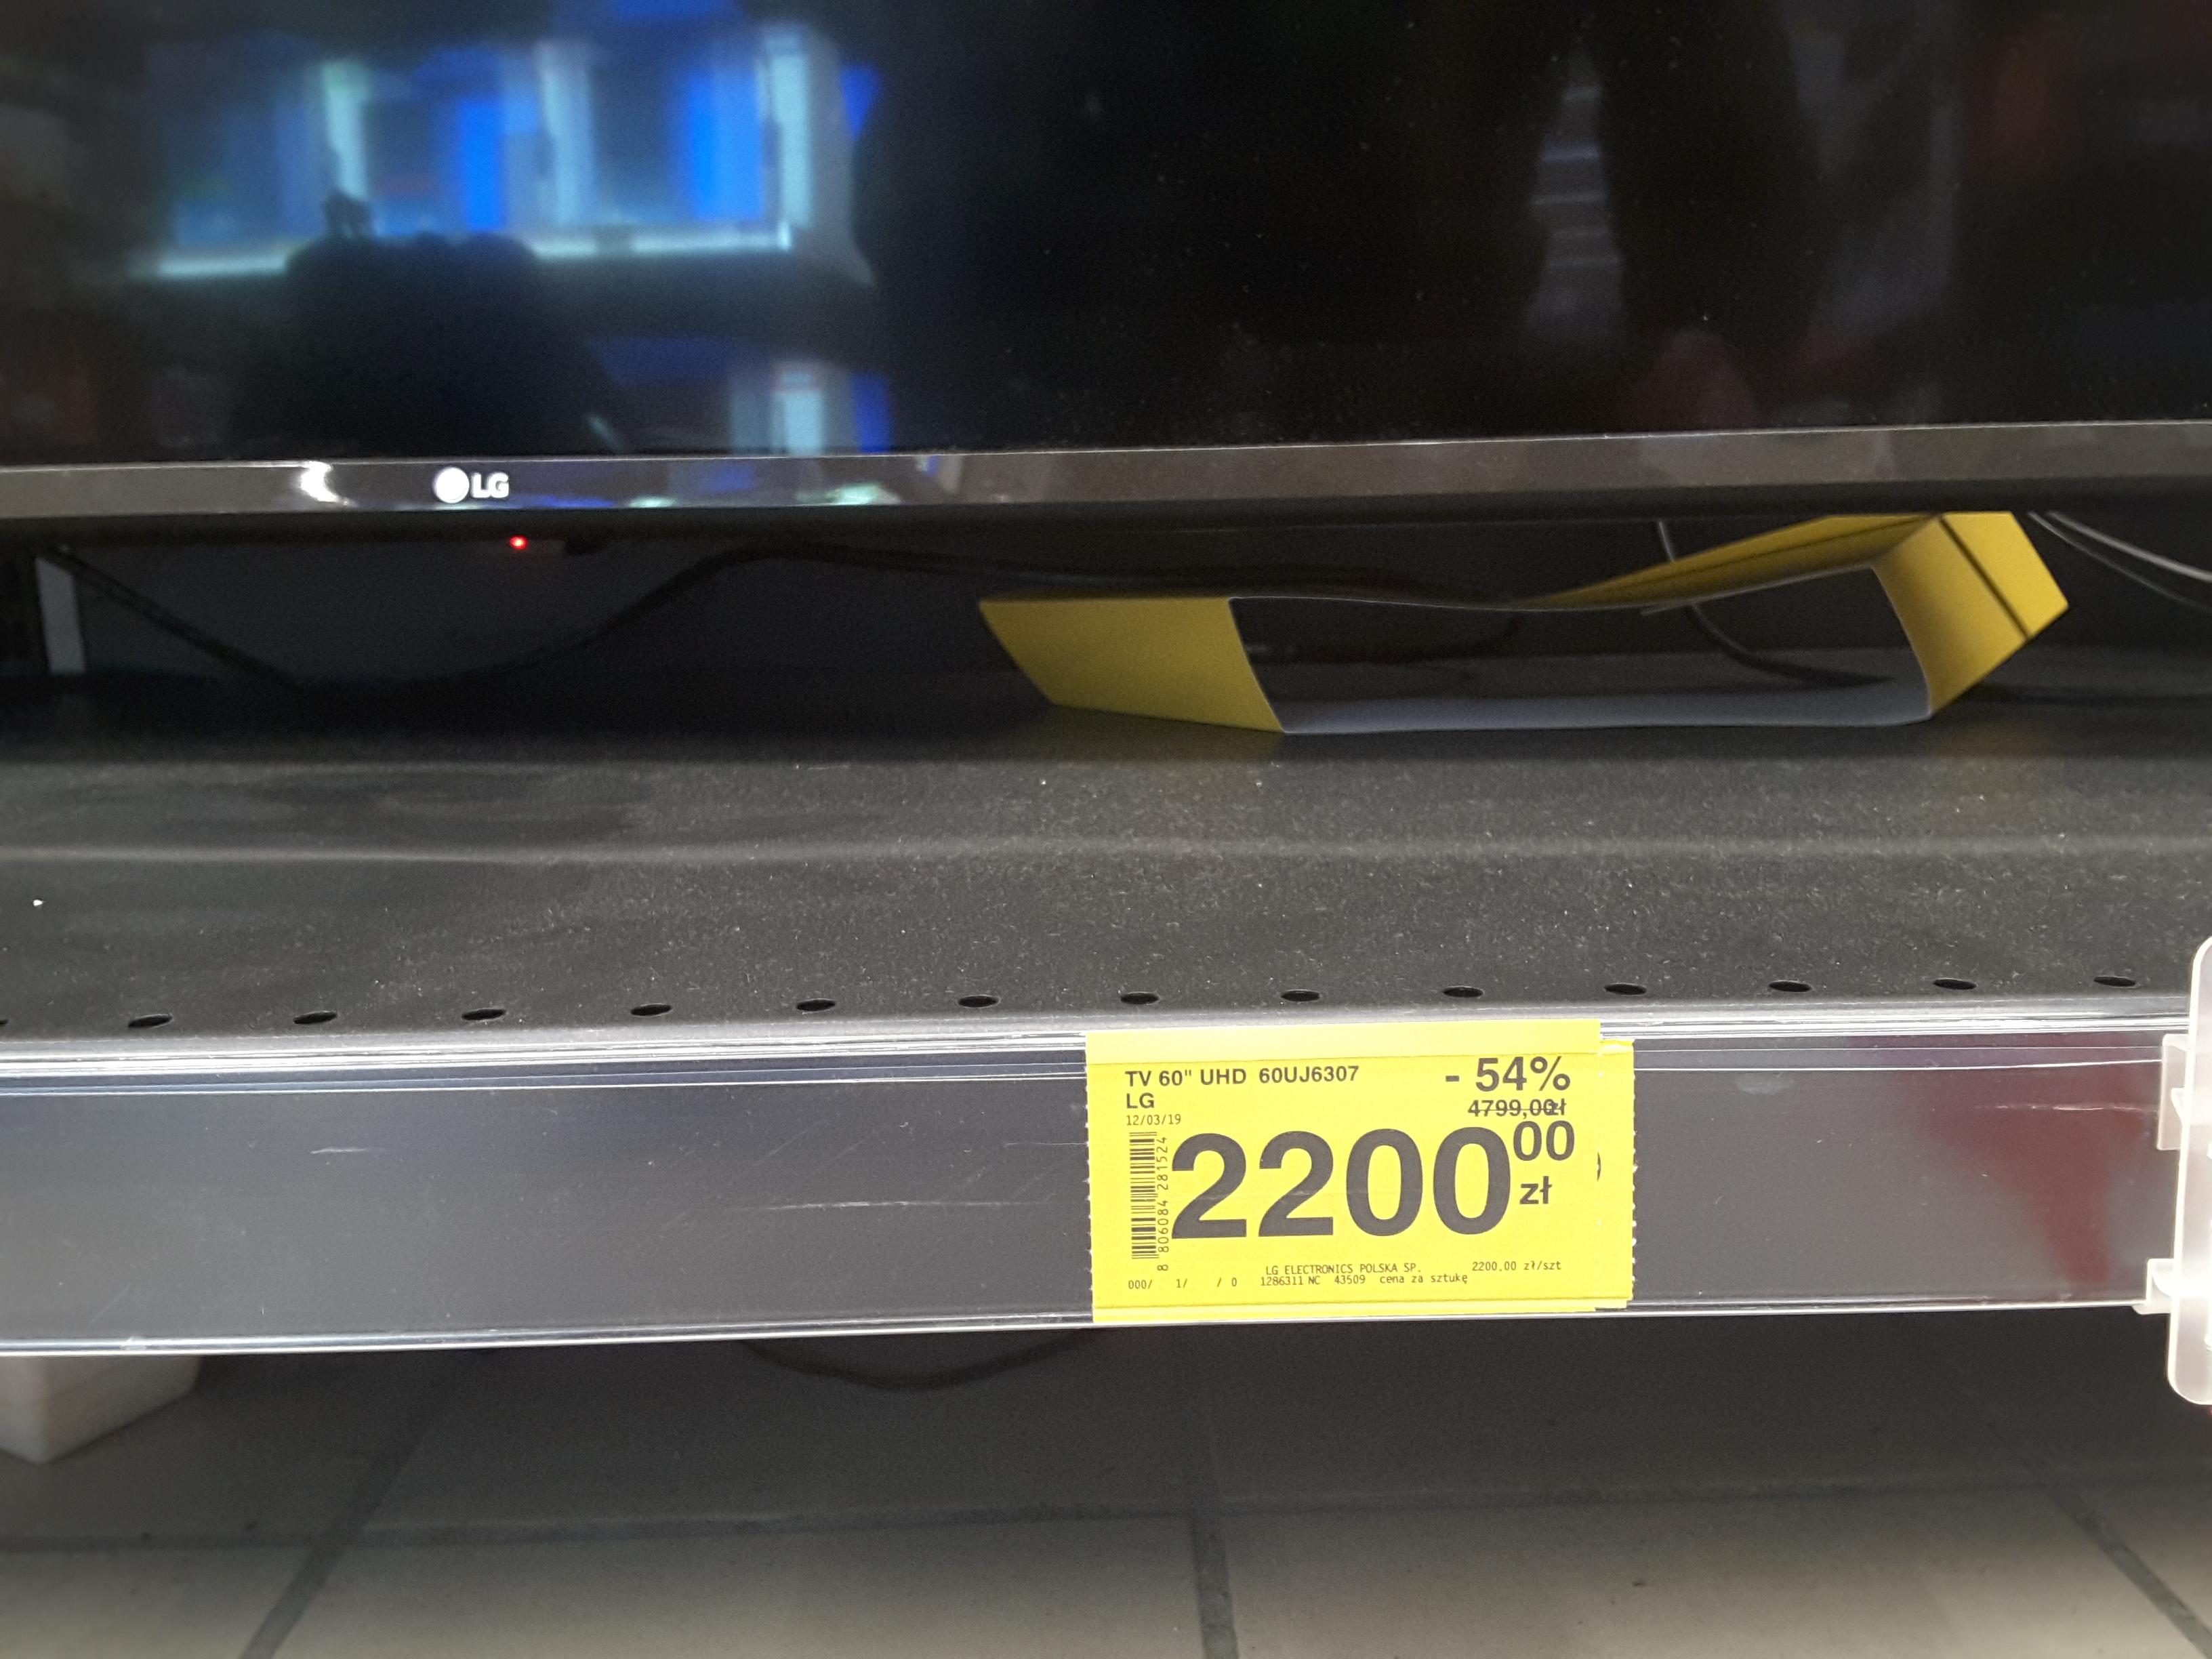 Telewizor LG 60UJ6307, Carrefour